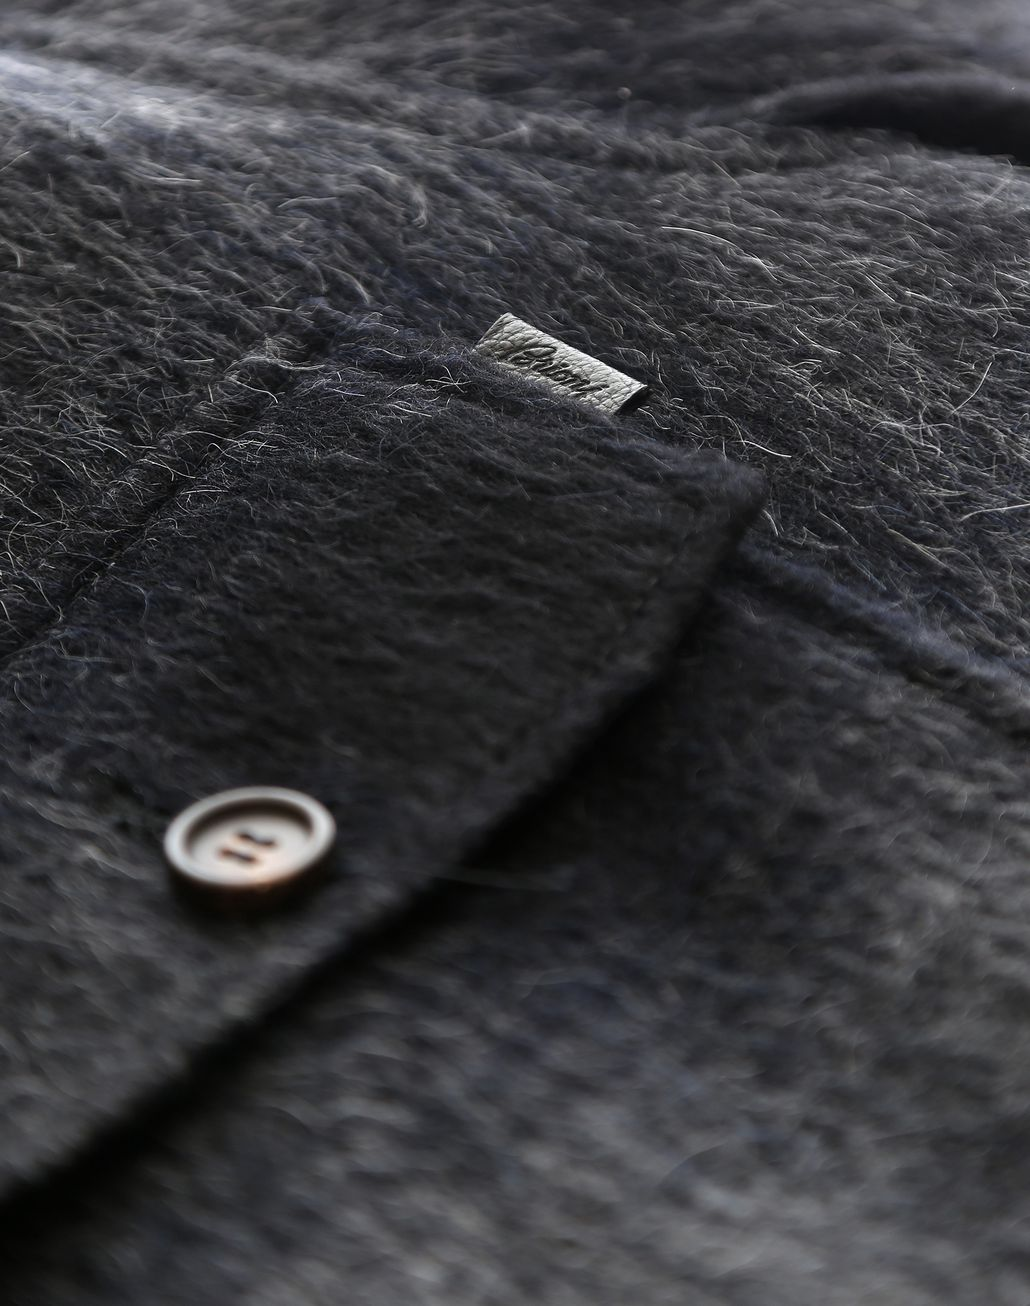 BRIONI Канадская куртка антрацитового цвета Верхняя одежда [*** pickupInStoreShippingNotGuaranteed_info ***] e